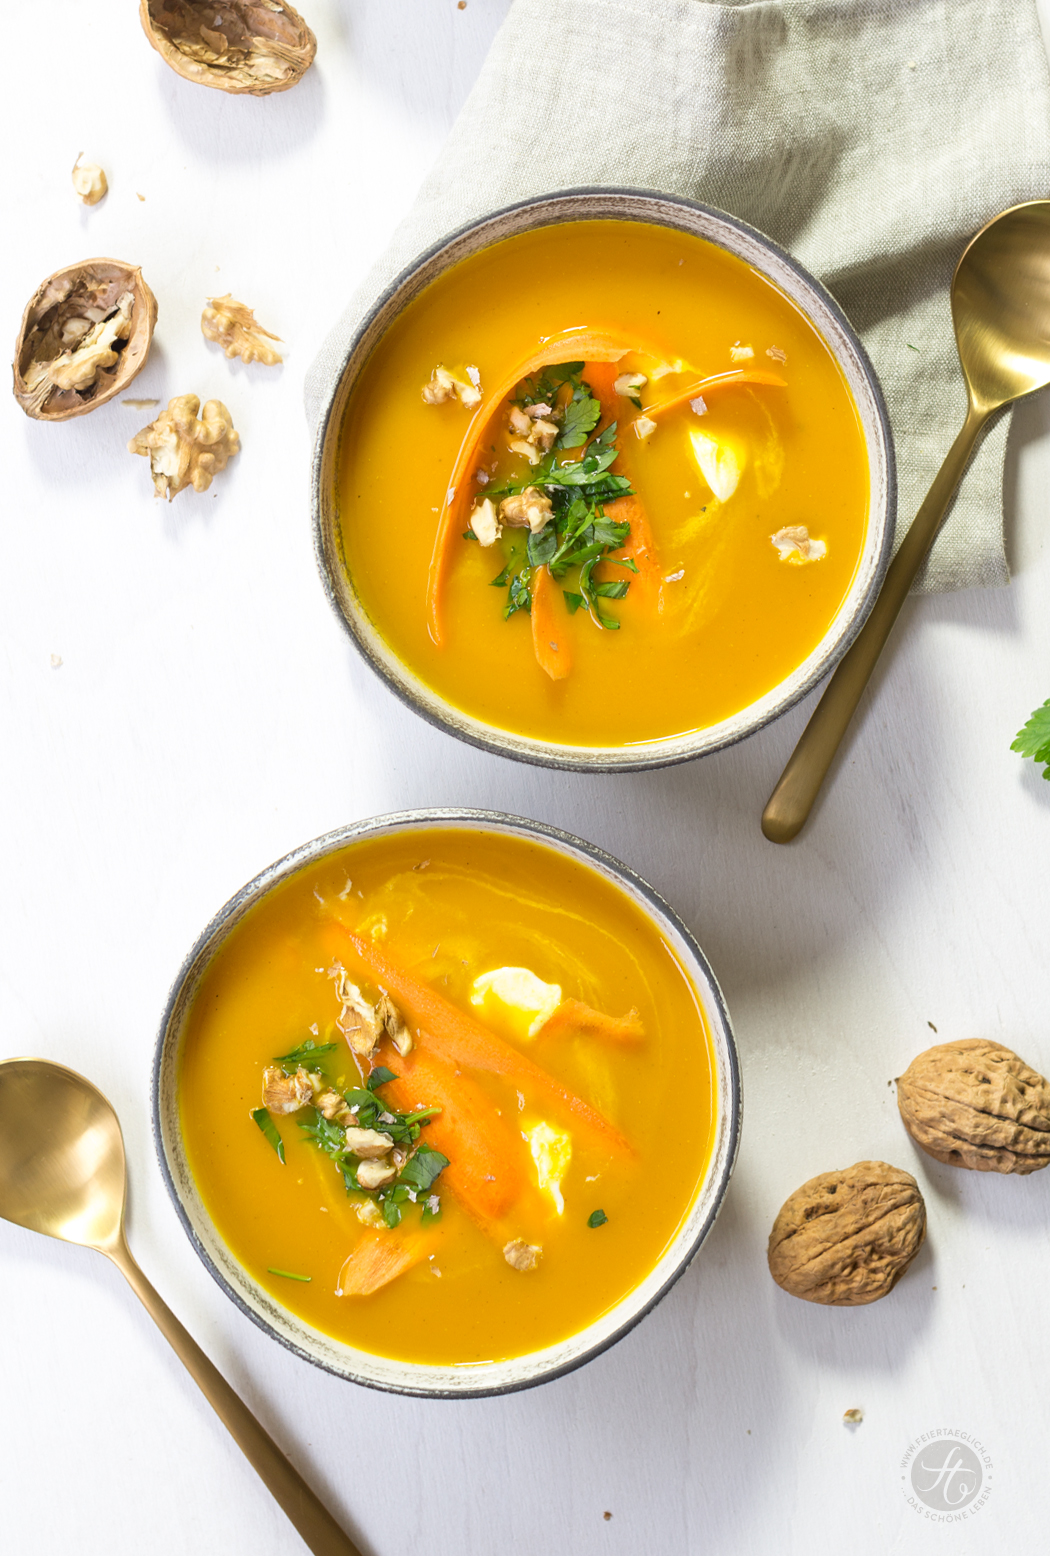 karotten orangen suppe rezepte suchen. Black Bedroom Furniture Sets. Home Design Ideas